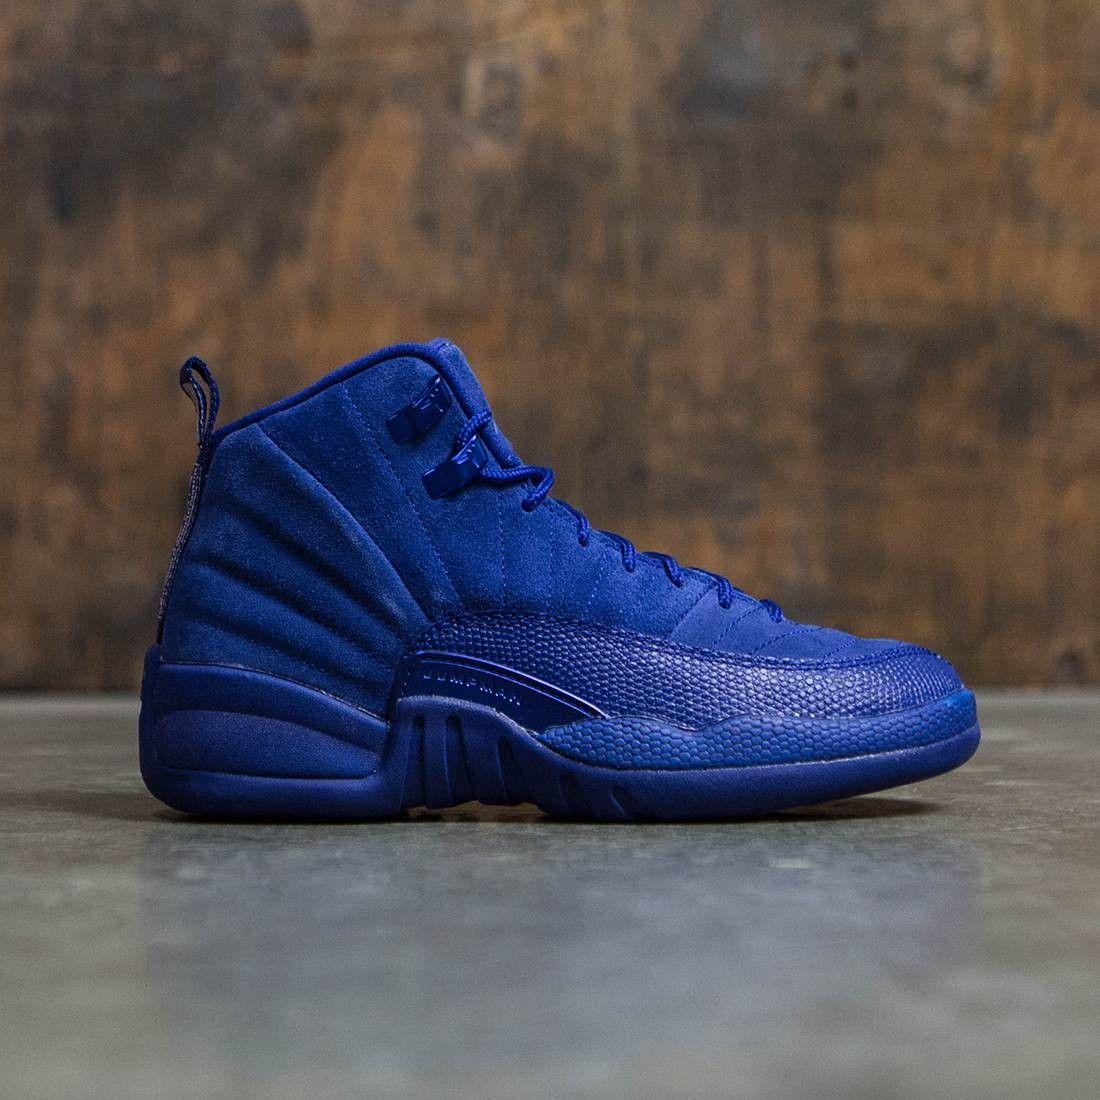 Air Jordan 12 Retro (GS) Big Kids (blue